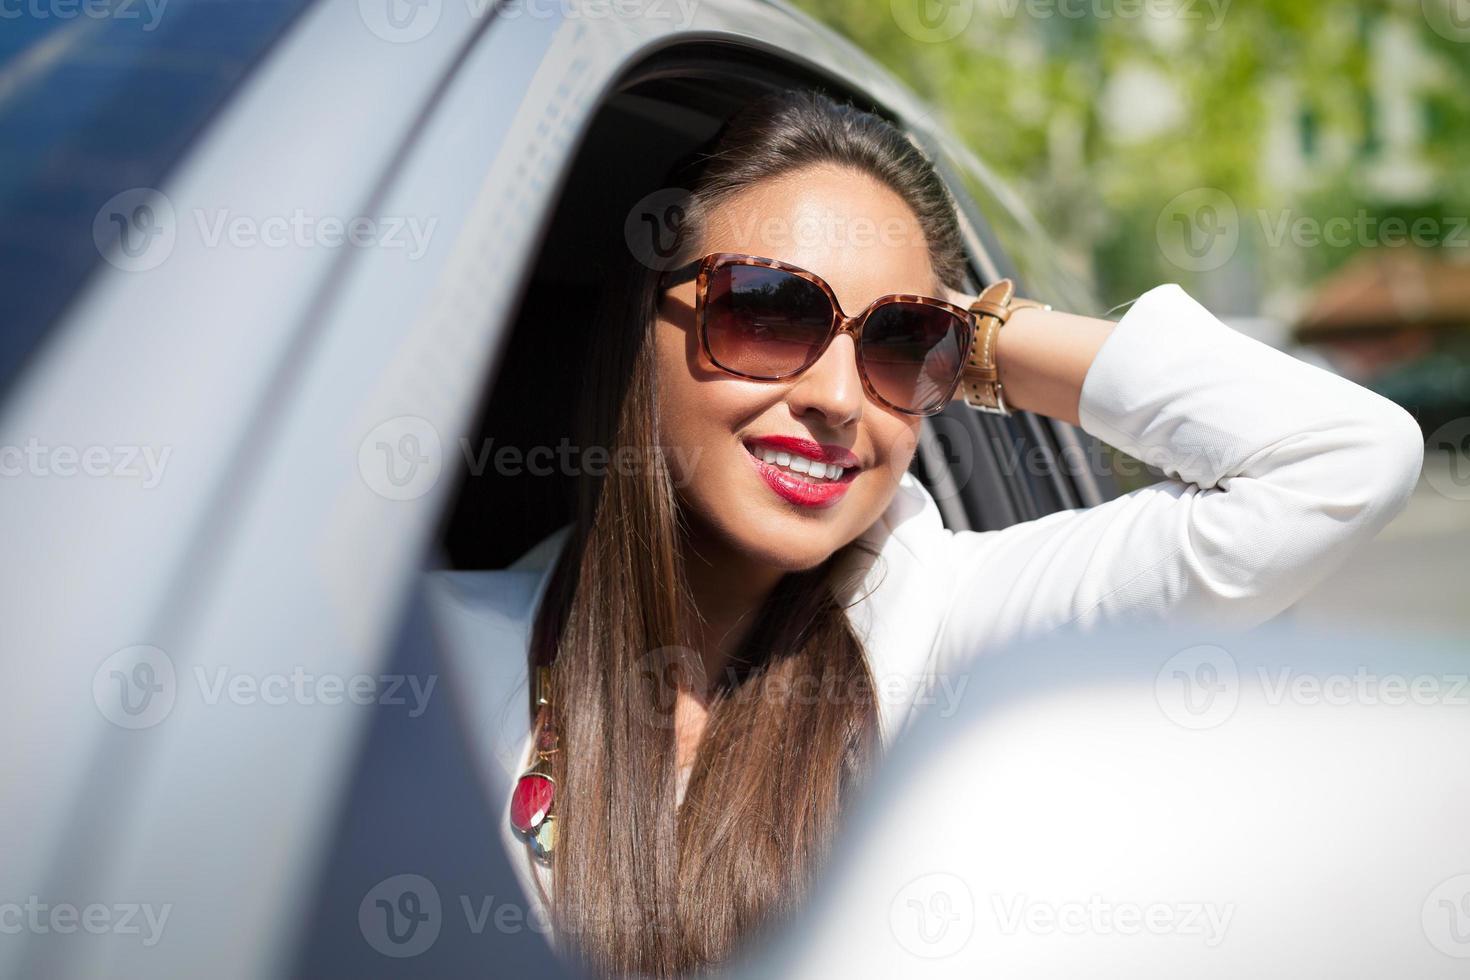 menina bonita em um carro foto